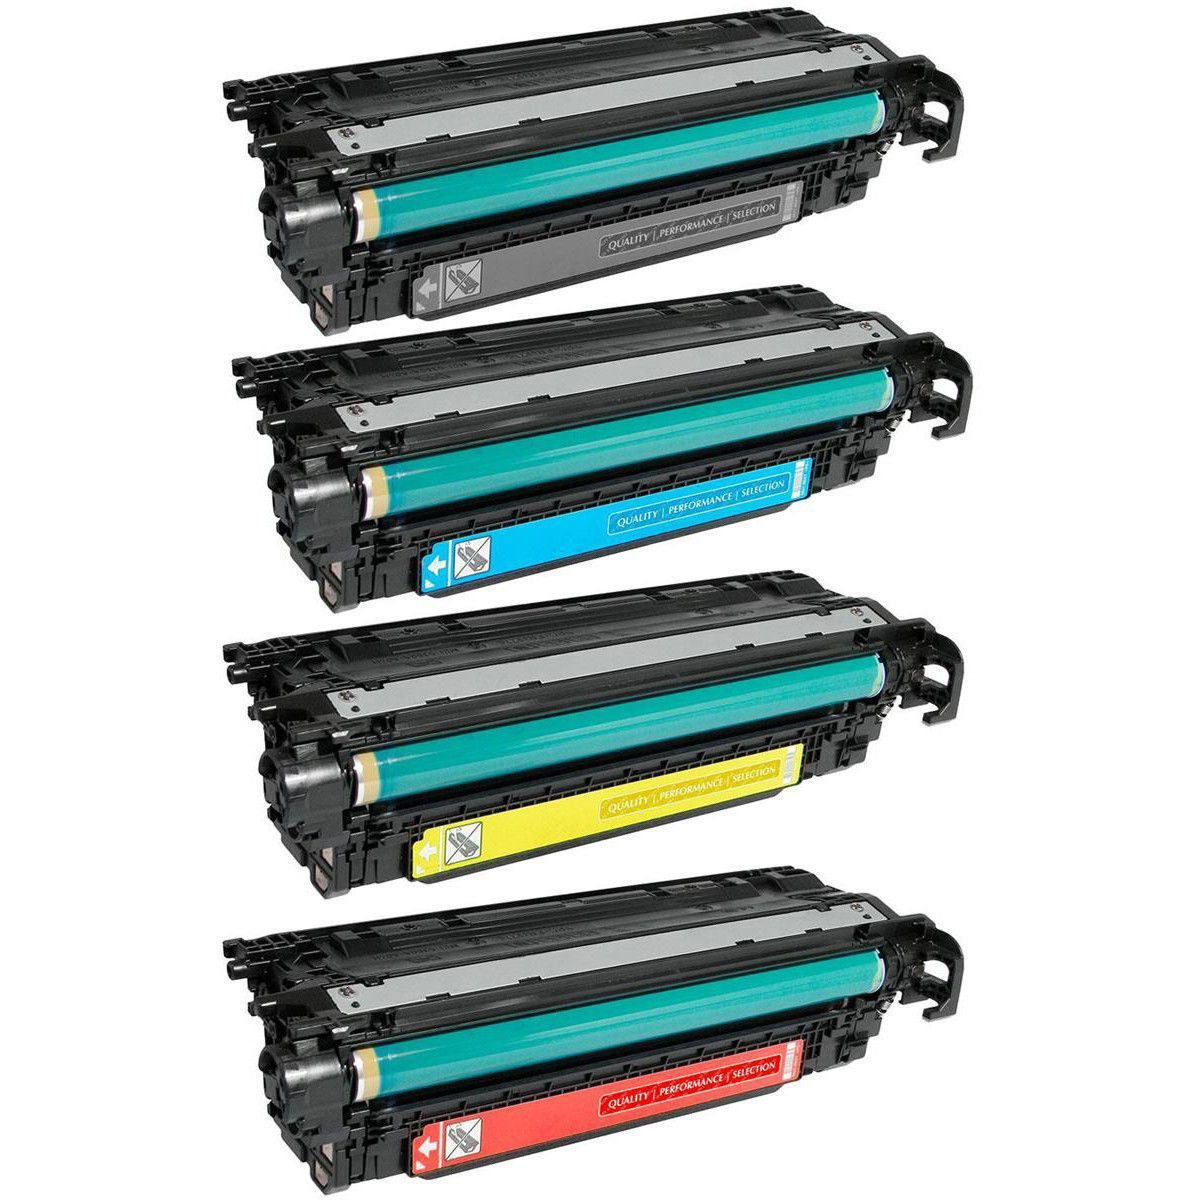 Compatível: Kit Colorido de Toner 507A 504A para HP CP3525 CP3525dn CM3530 CM3530fs M551dn M570dn M551n M575c M551